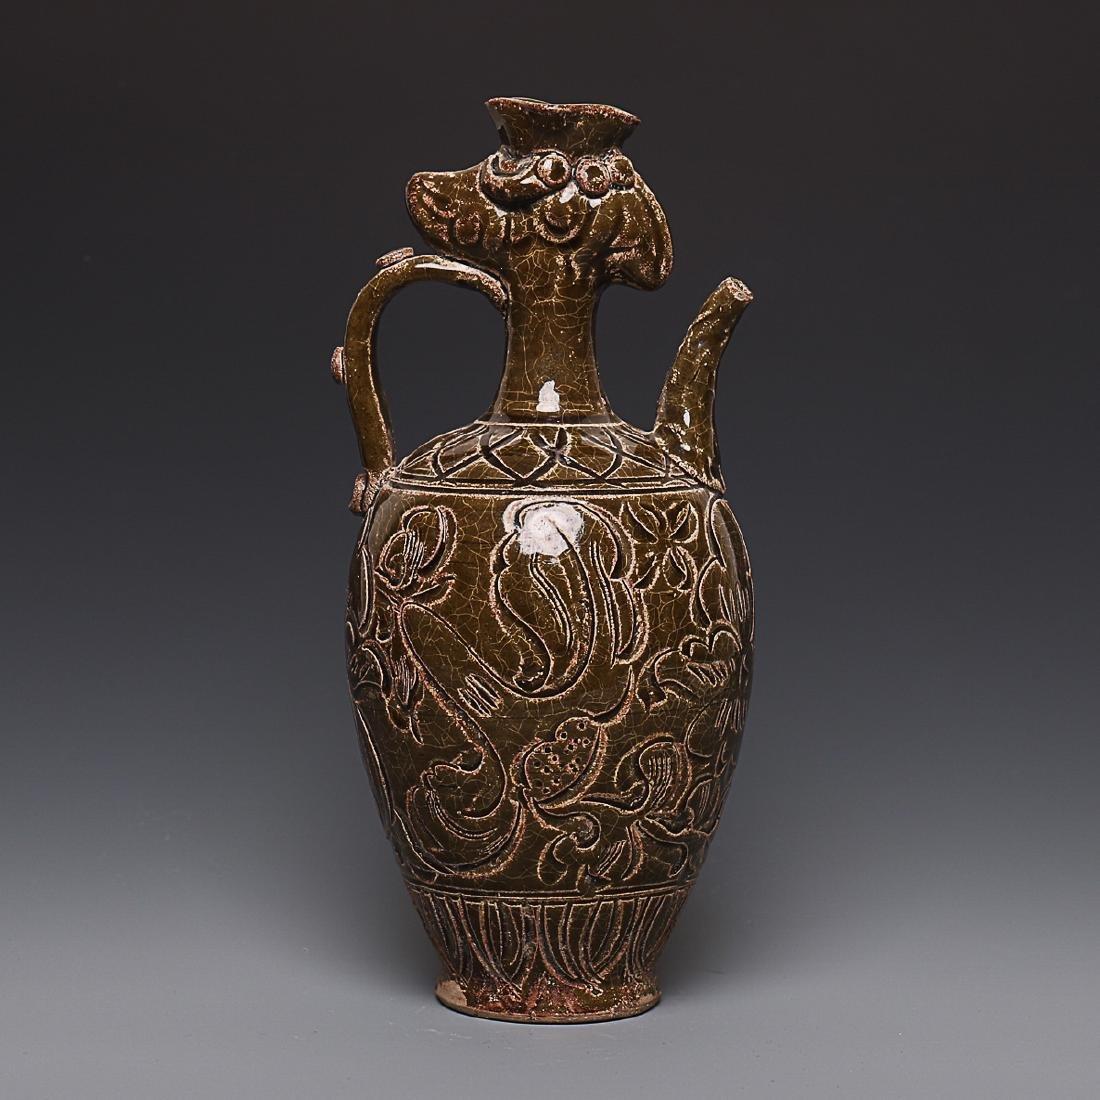 Vintage Chinese Porcelain Pot - 3